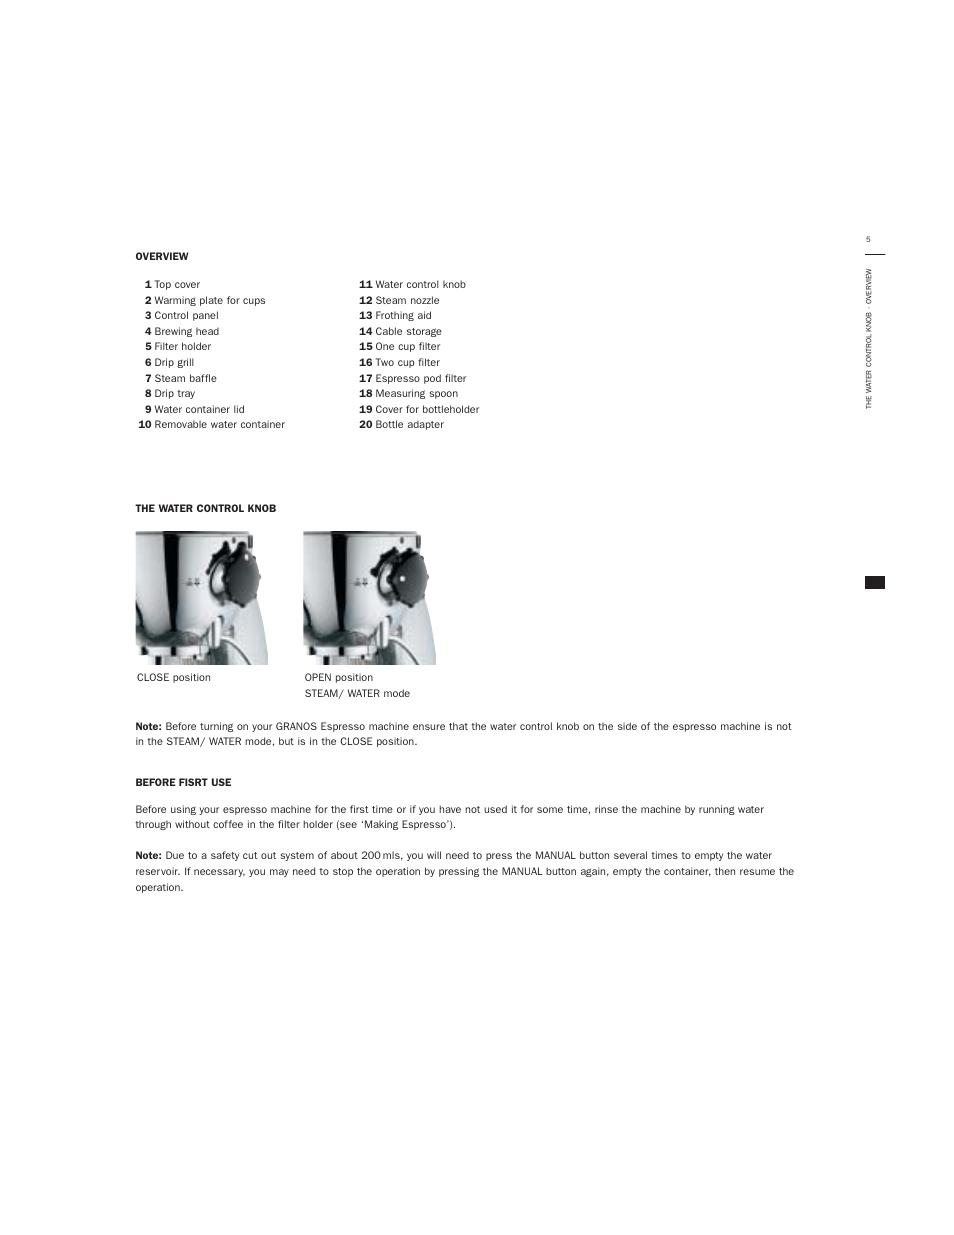 bodum granos 3020 user manual page 7 26 rh manualsdir com John Deere 3020 Specifications Deere 3020